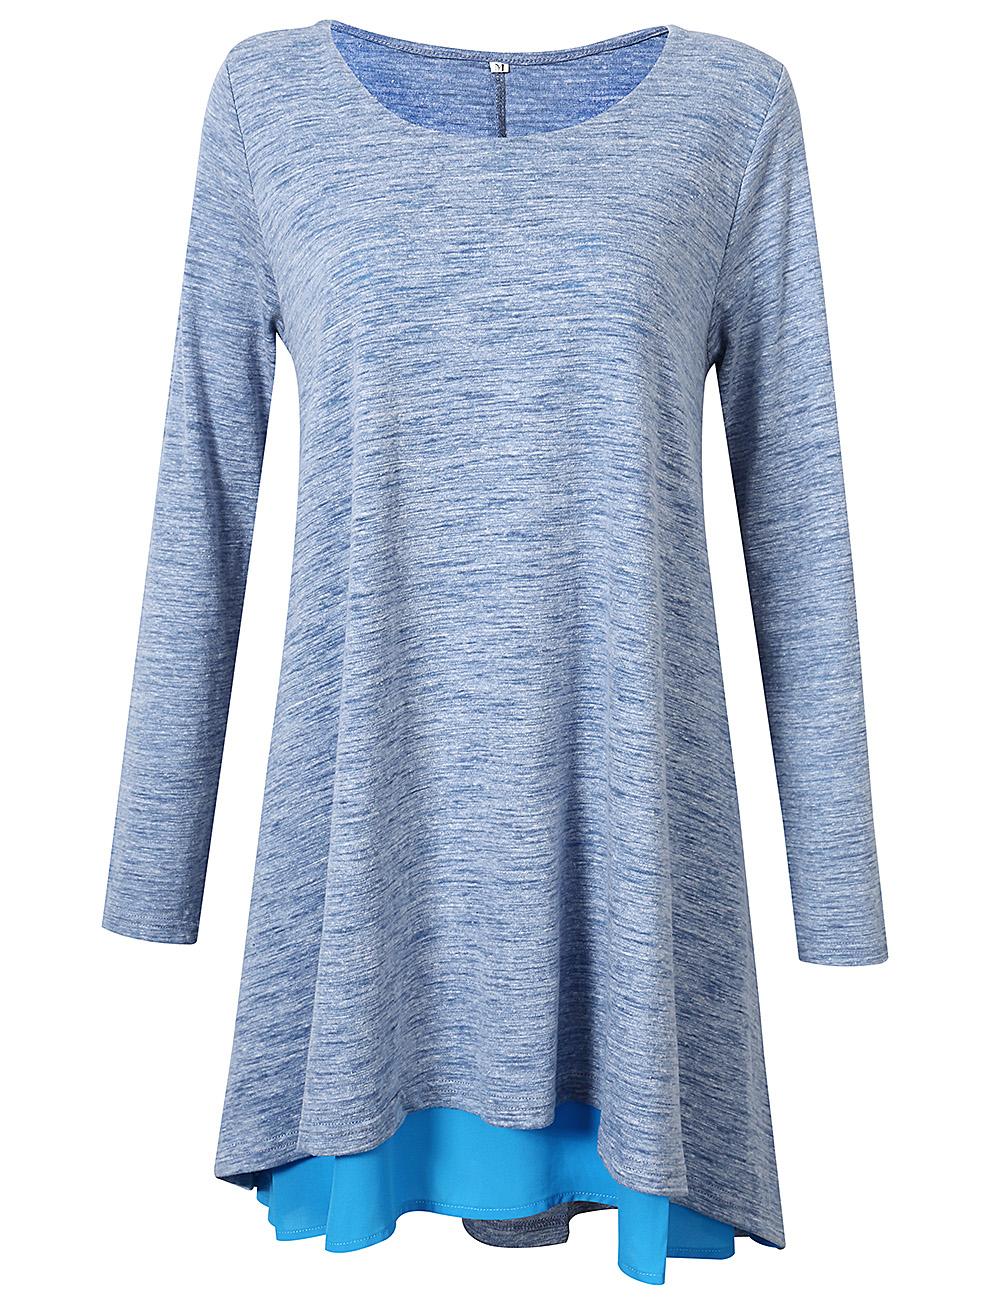 [US Direct] Leadingstar Women's Long Sleeve Round Neck A-line Skirt Pendulum Stitching Loose T-shirt Dress Gray S